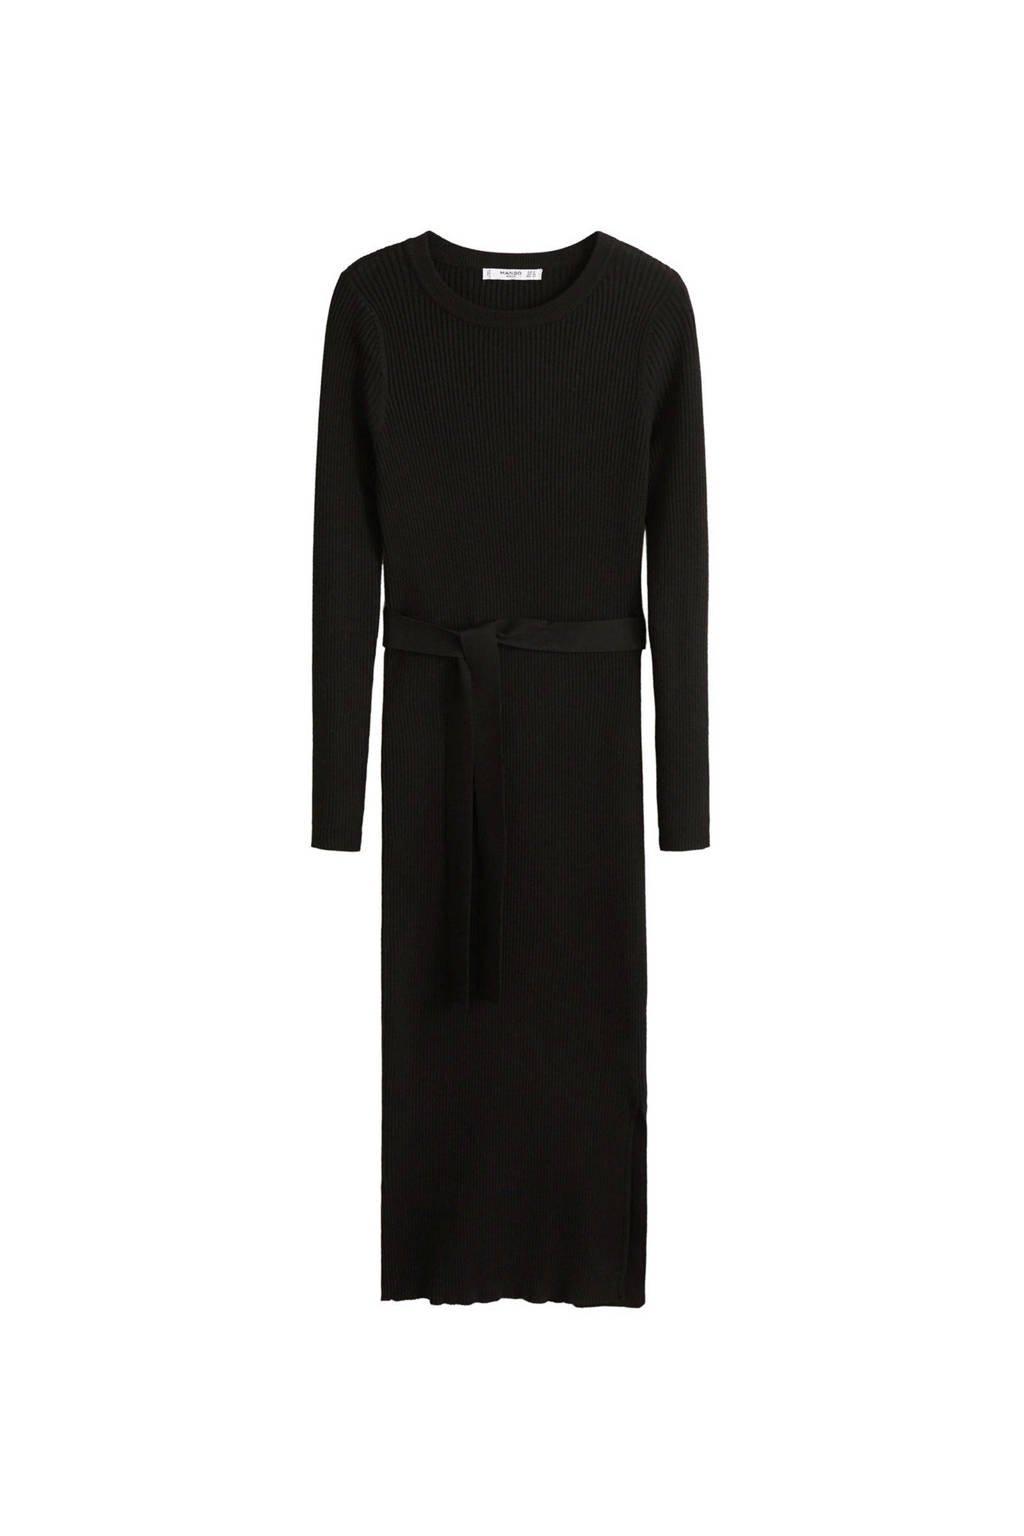 Mango jurk van geribde stof zwart, Zwart